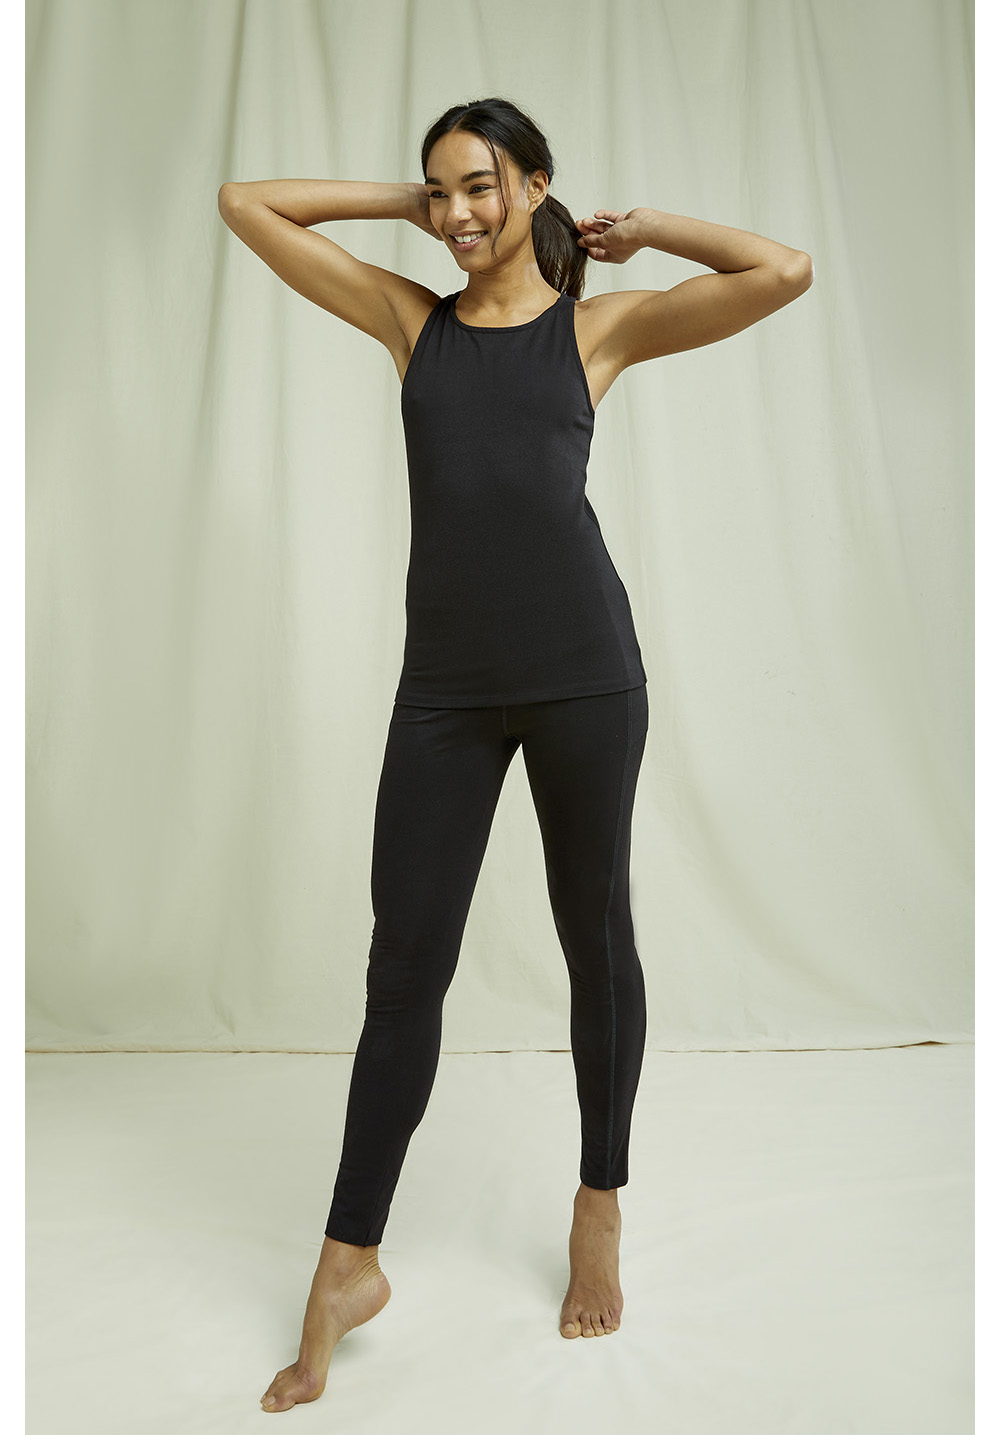 Yoga Racer Back Vest In Black